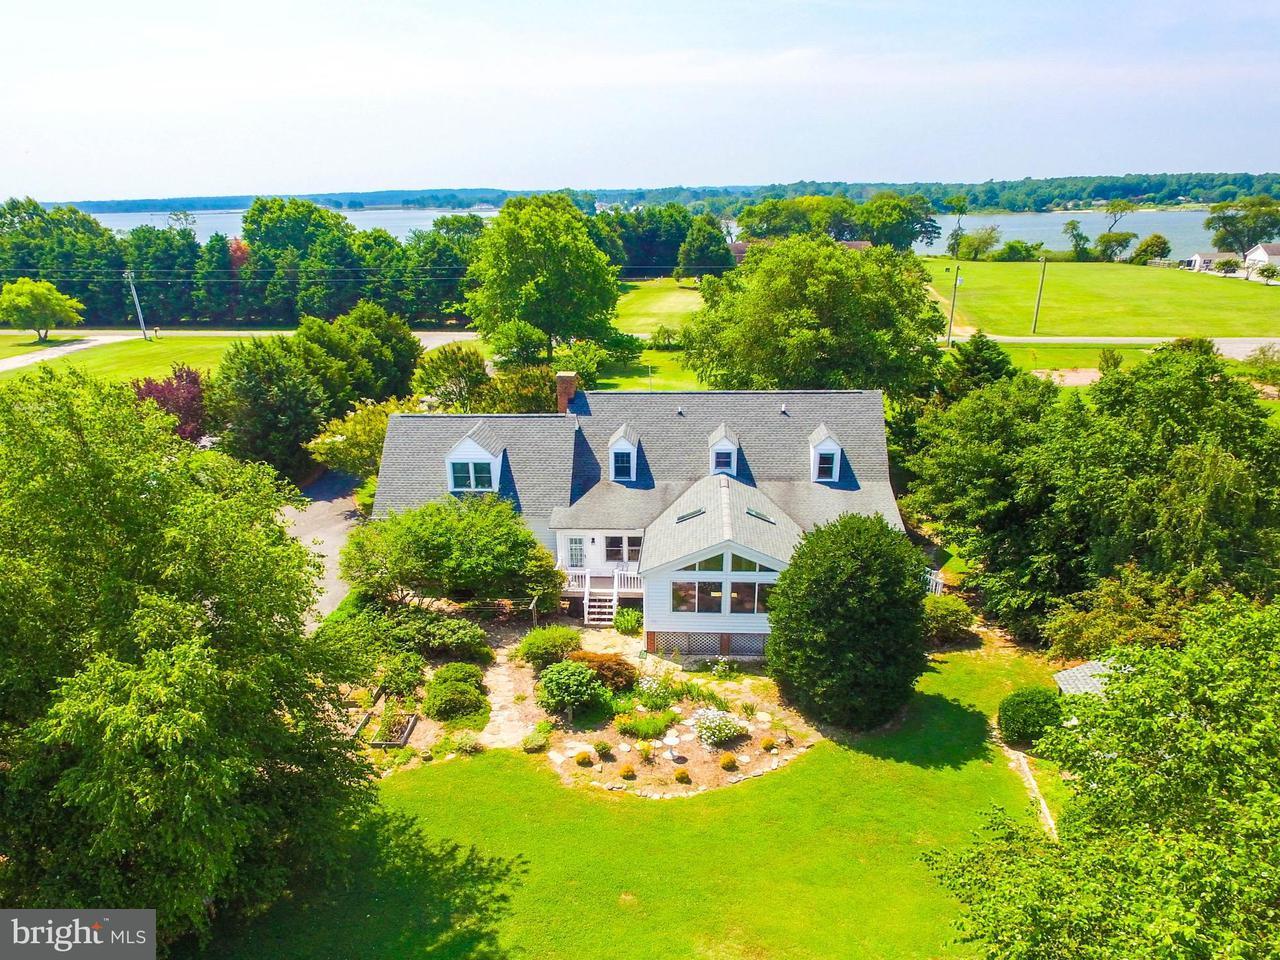 獨棟家庭住宅 為 出售 在 1509 Cowart Road 1509 Cowart Road Lottsburg, 弗吉尼亞州 22511 美國